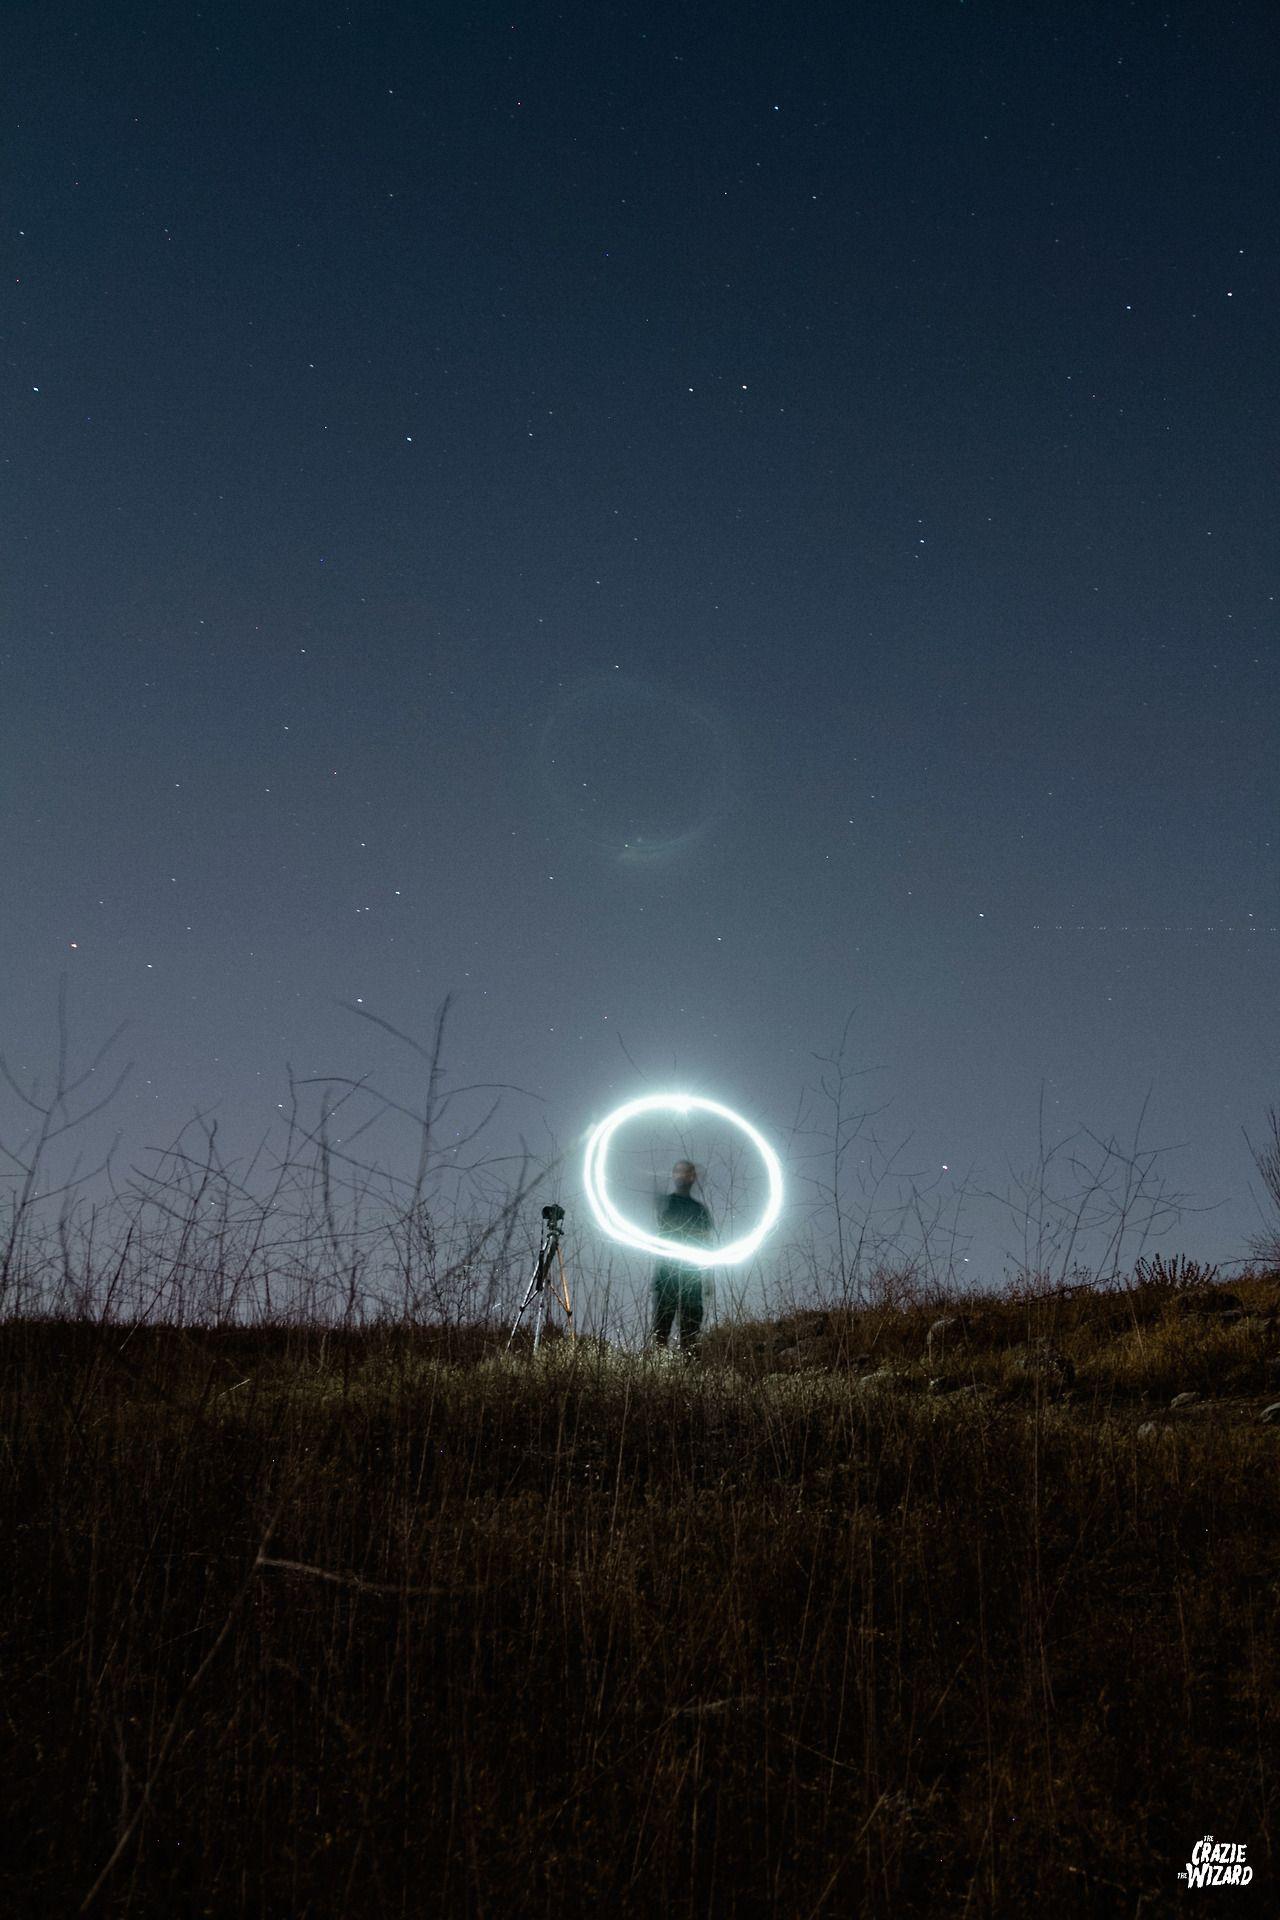 light photography thecraziethewizard.tumblr.com